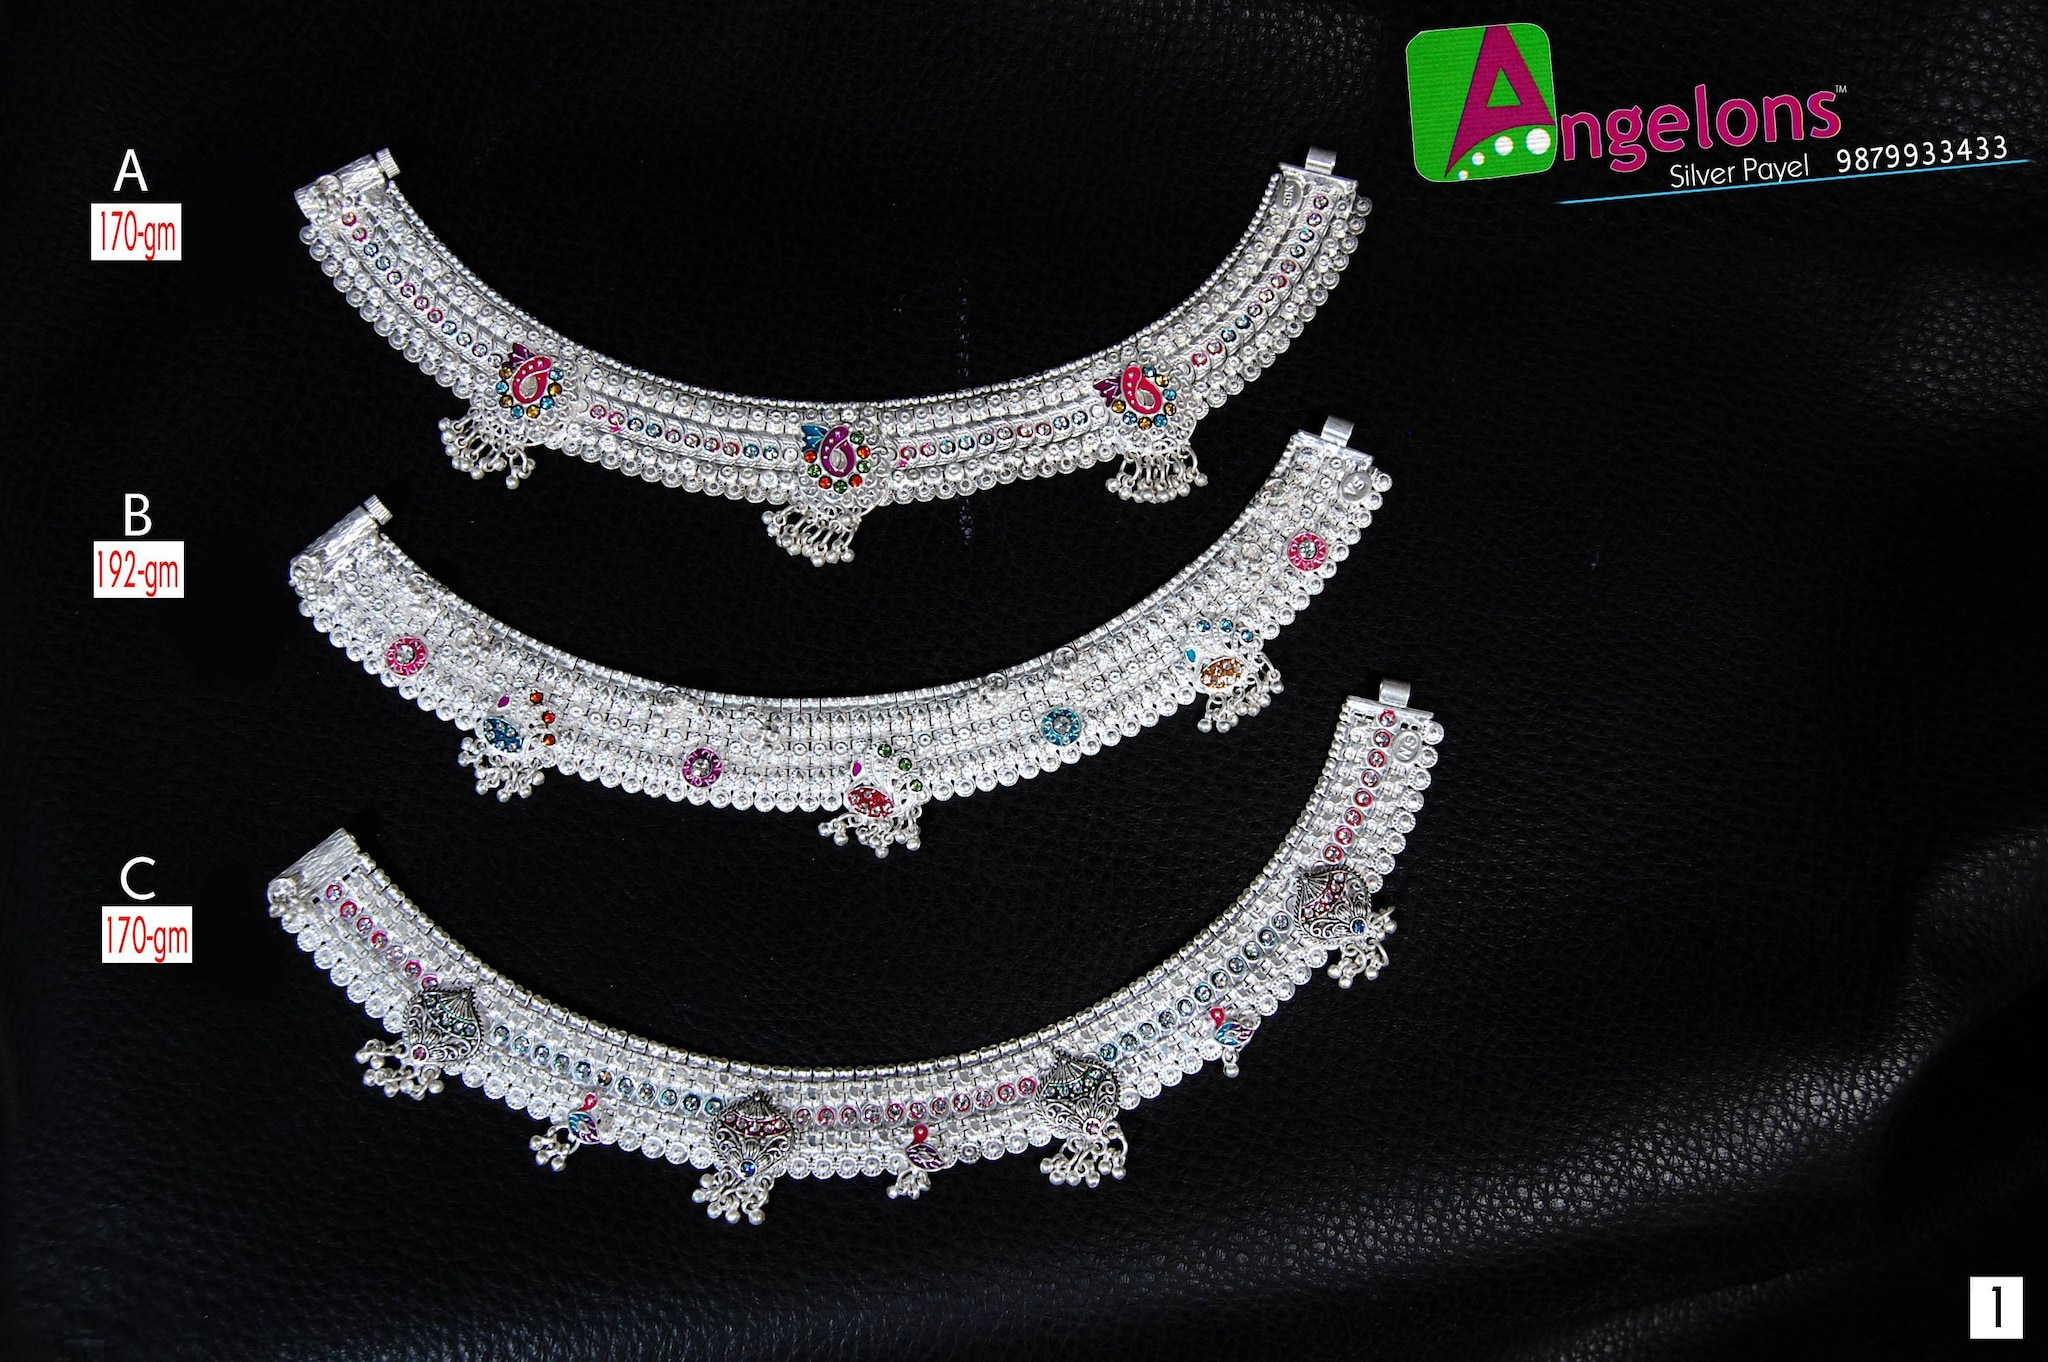 Angelons Silver Payal, Ranchhodnagar - Jewellery Showrooms in ...